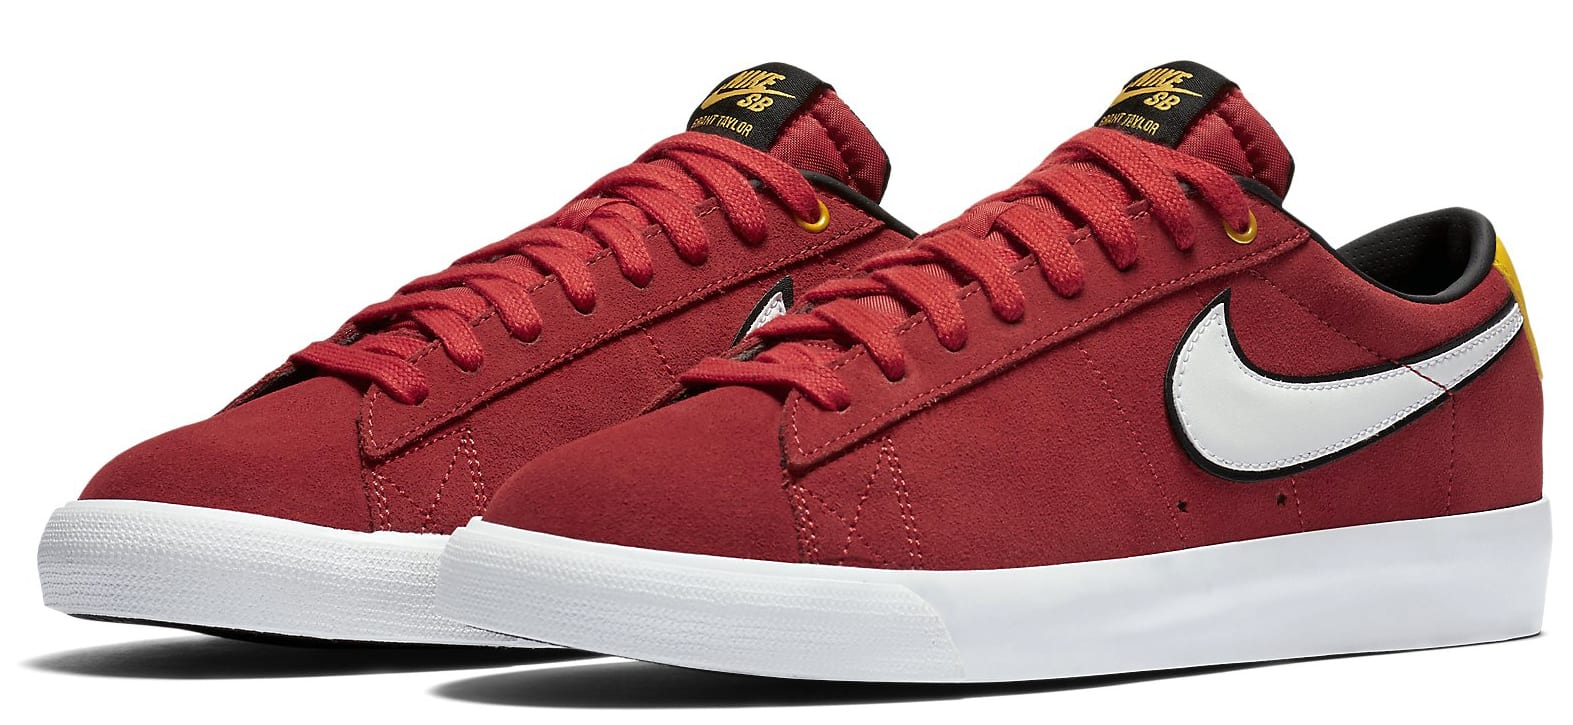 low cost 92701 f4a73 Nike SB Blazer Low GT Skate Shoes - thumbnail 2